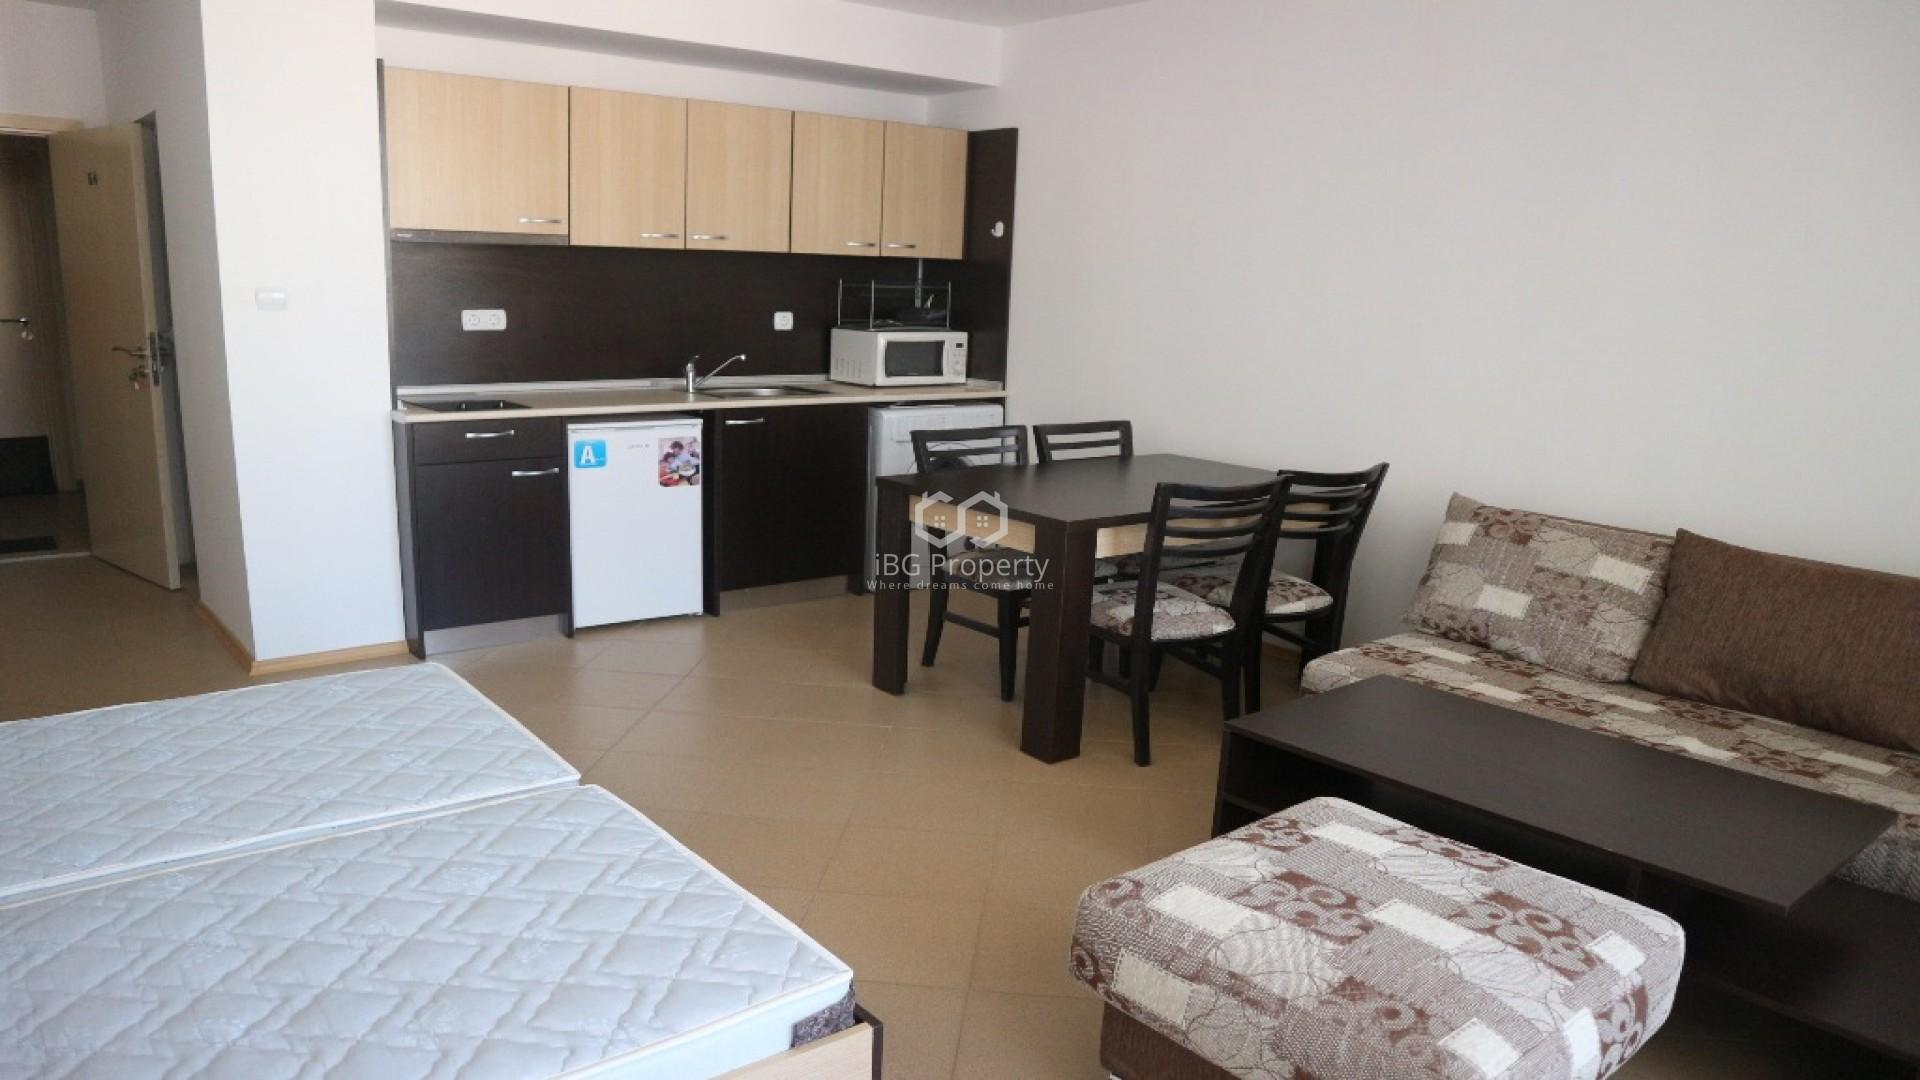 Eдностаен апартамент Слънчев бряг 51 m2